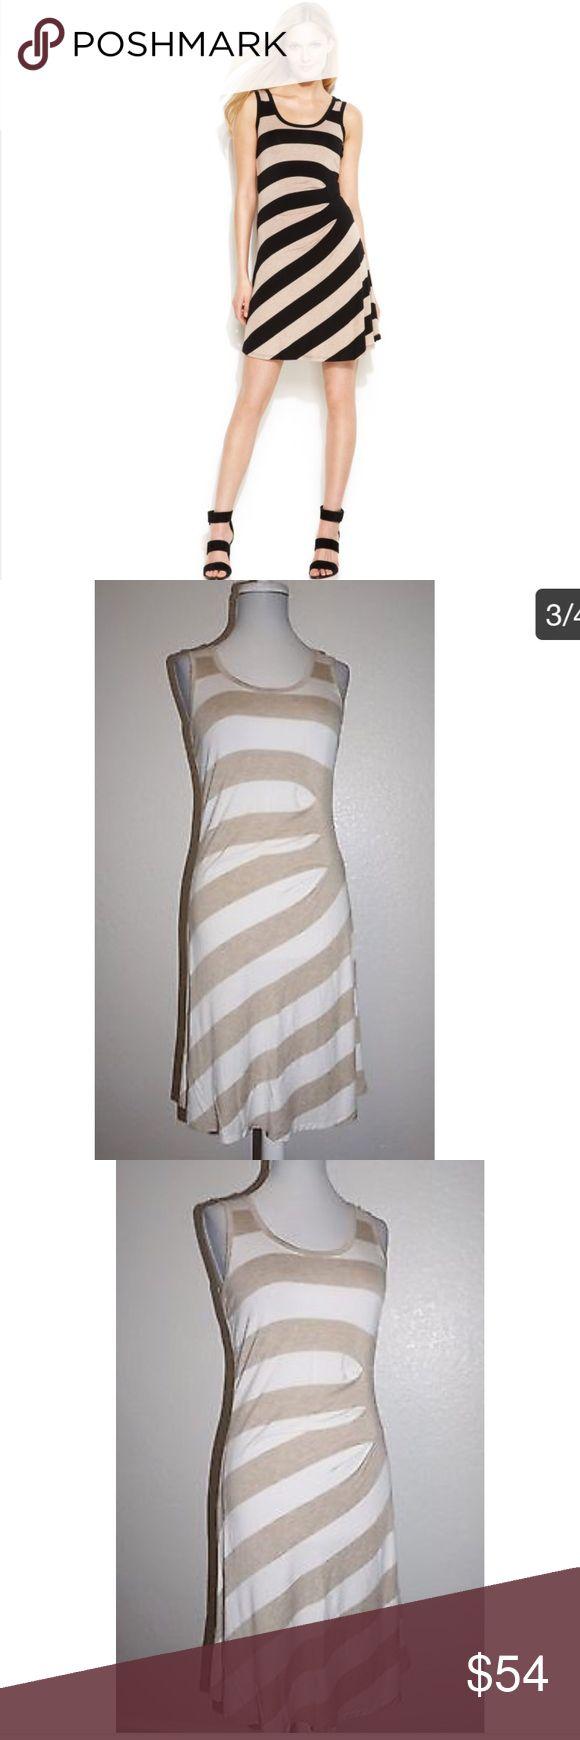 Alvin Klein Beige Gathered Striped Tank Dress Sexy summer gathered striped dress in beige & white by Calvin Klein. 96% rayon 4% spandex. Size 2. EUC. Calvin Klein Dresses Asymmetrical